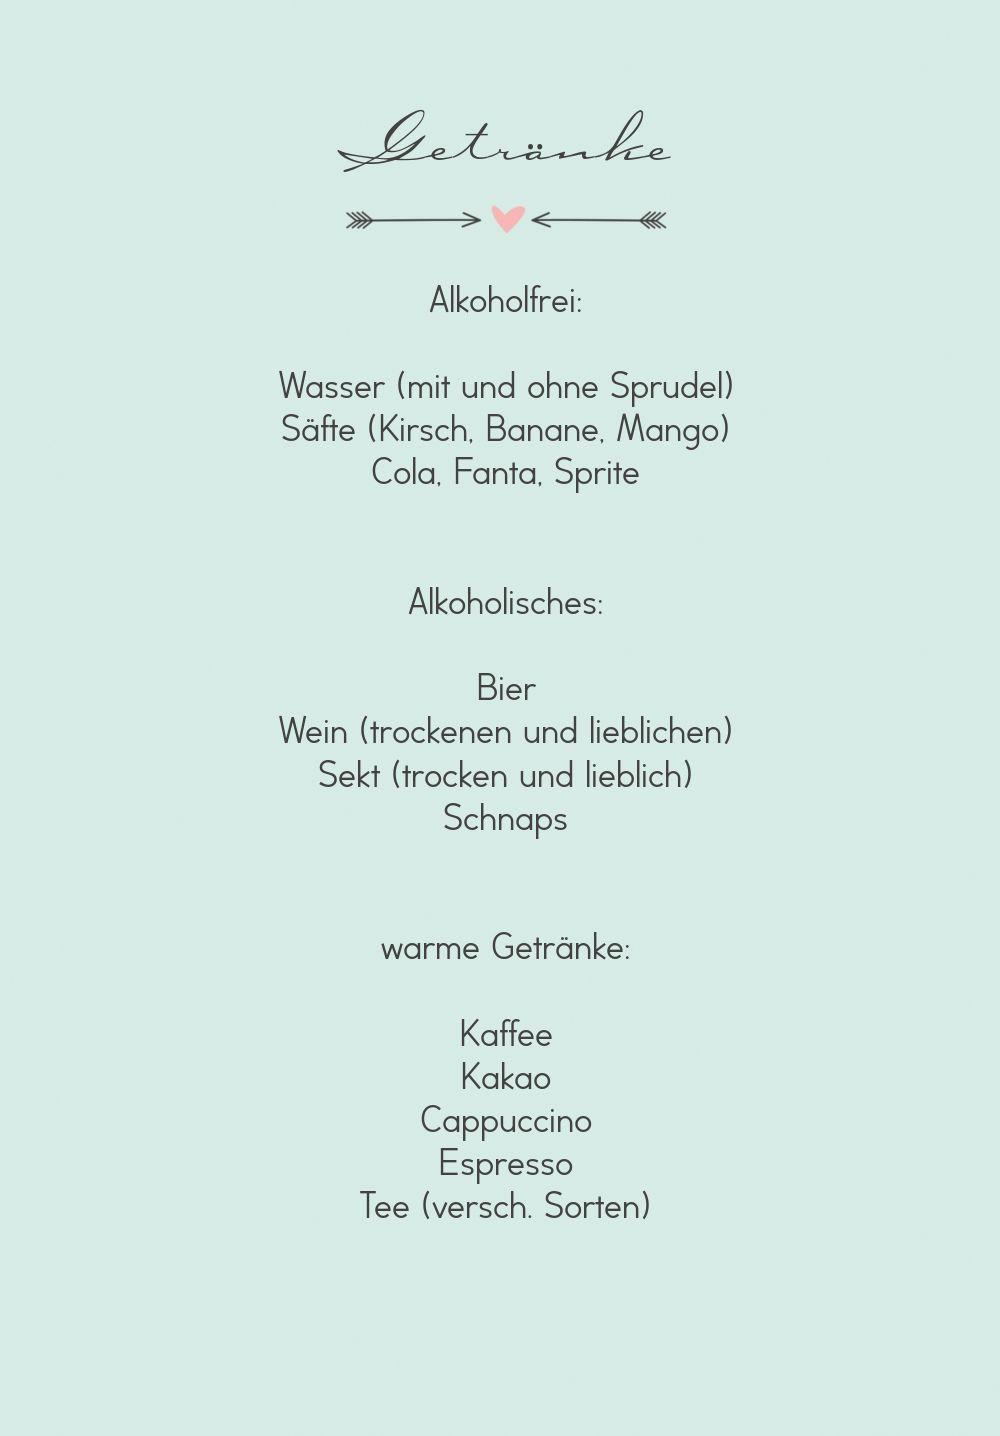 Ansicht 4 - Hochzeit Menükarte Pärchen - Männer